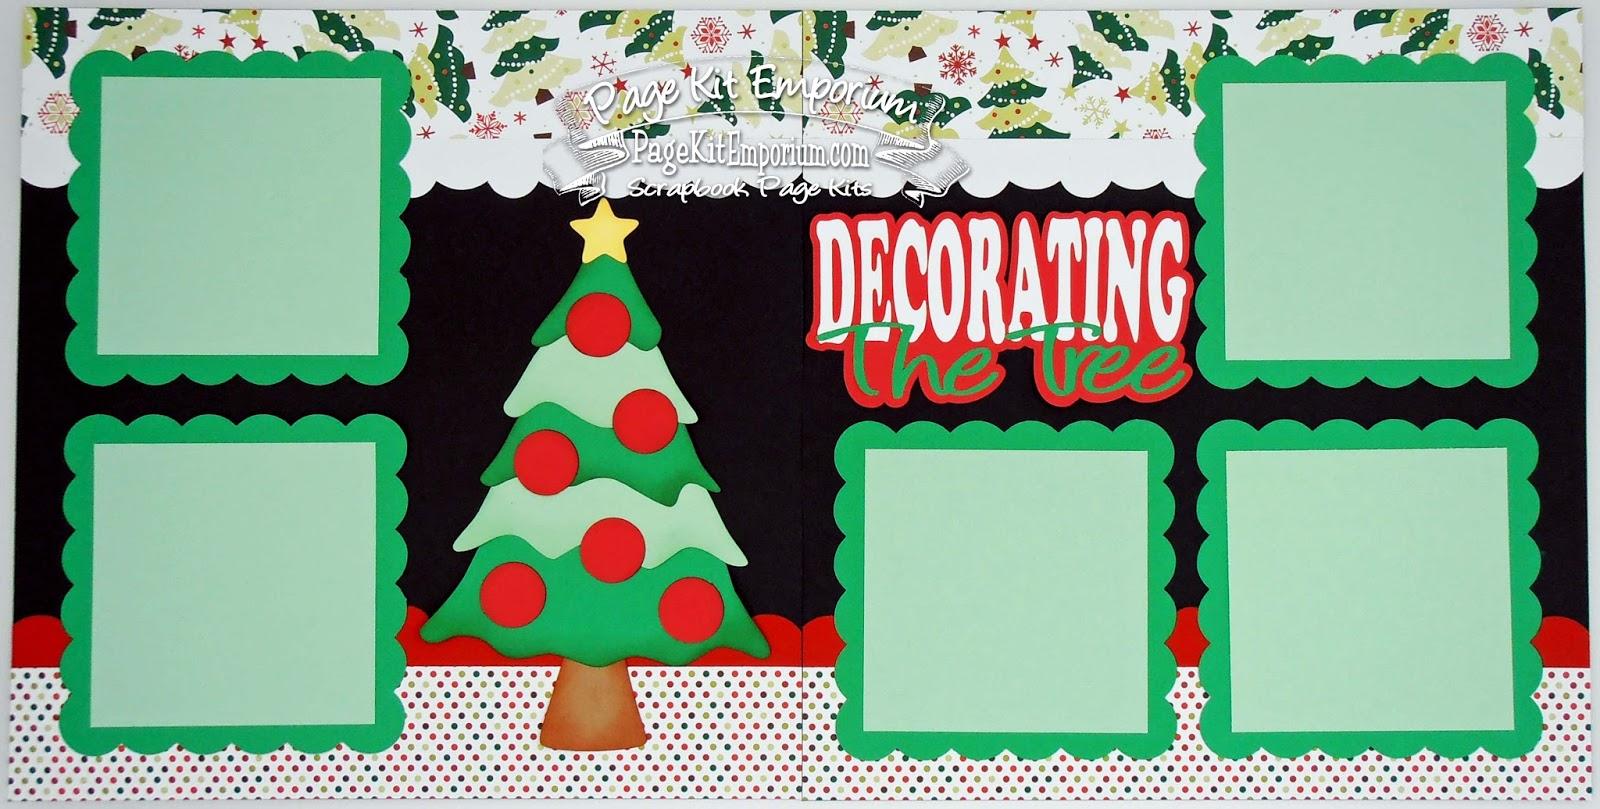 BLJ Graves Studio Decorating The Tree Christmas Scrapbook